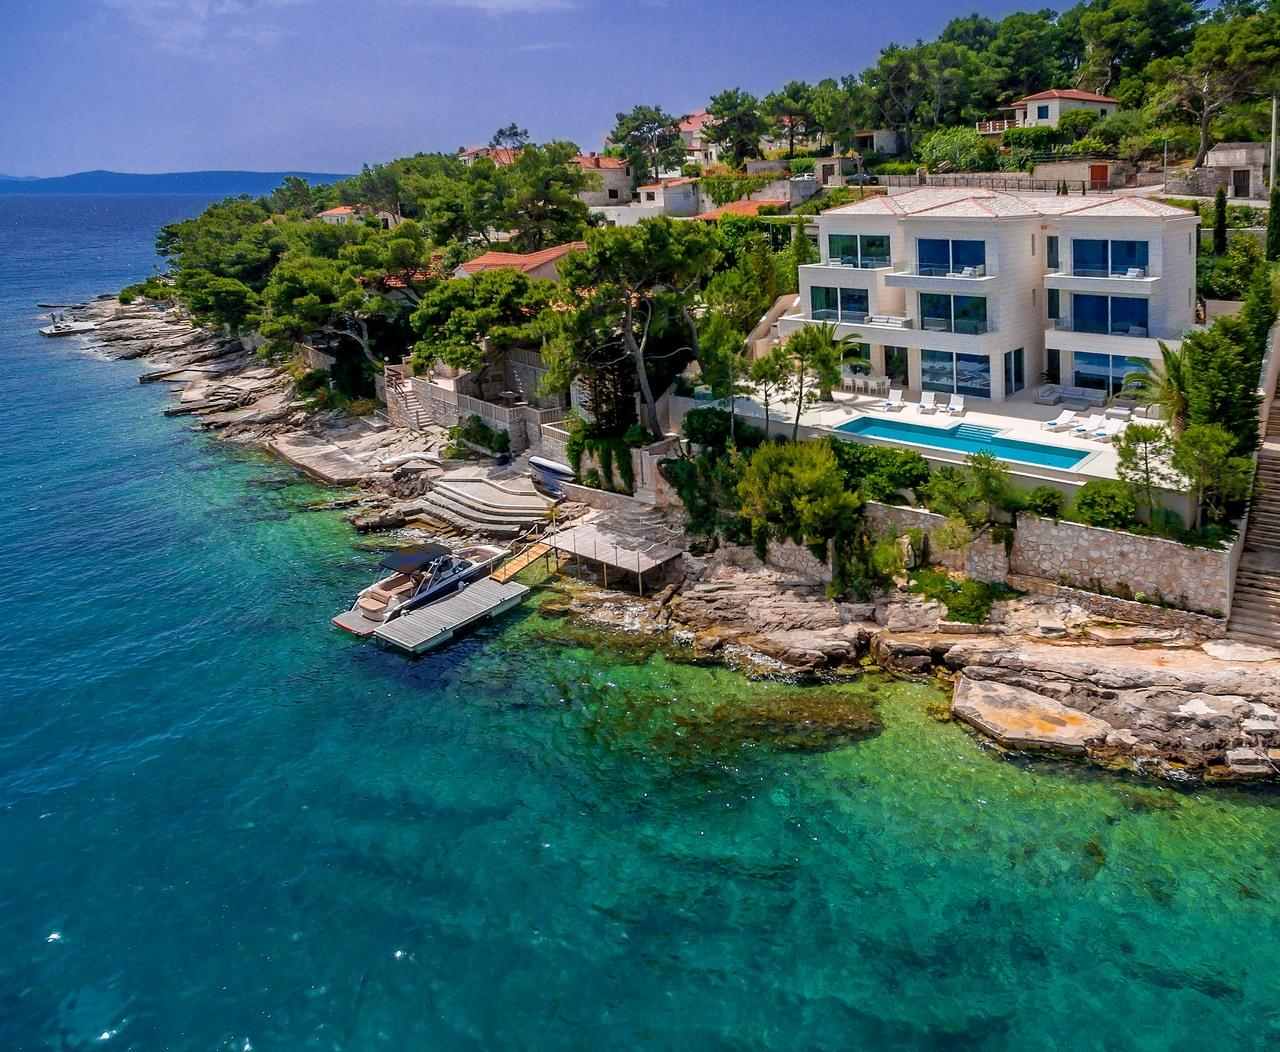 Beachfront VIlla Seven Sins for Rent on Brac Island - Luxurious 6-bedroom holiday villa with pool